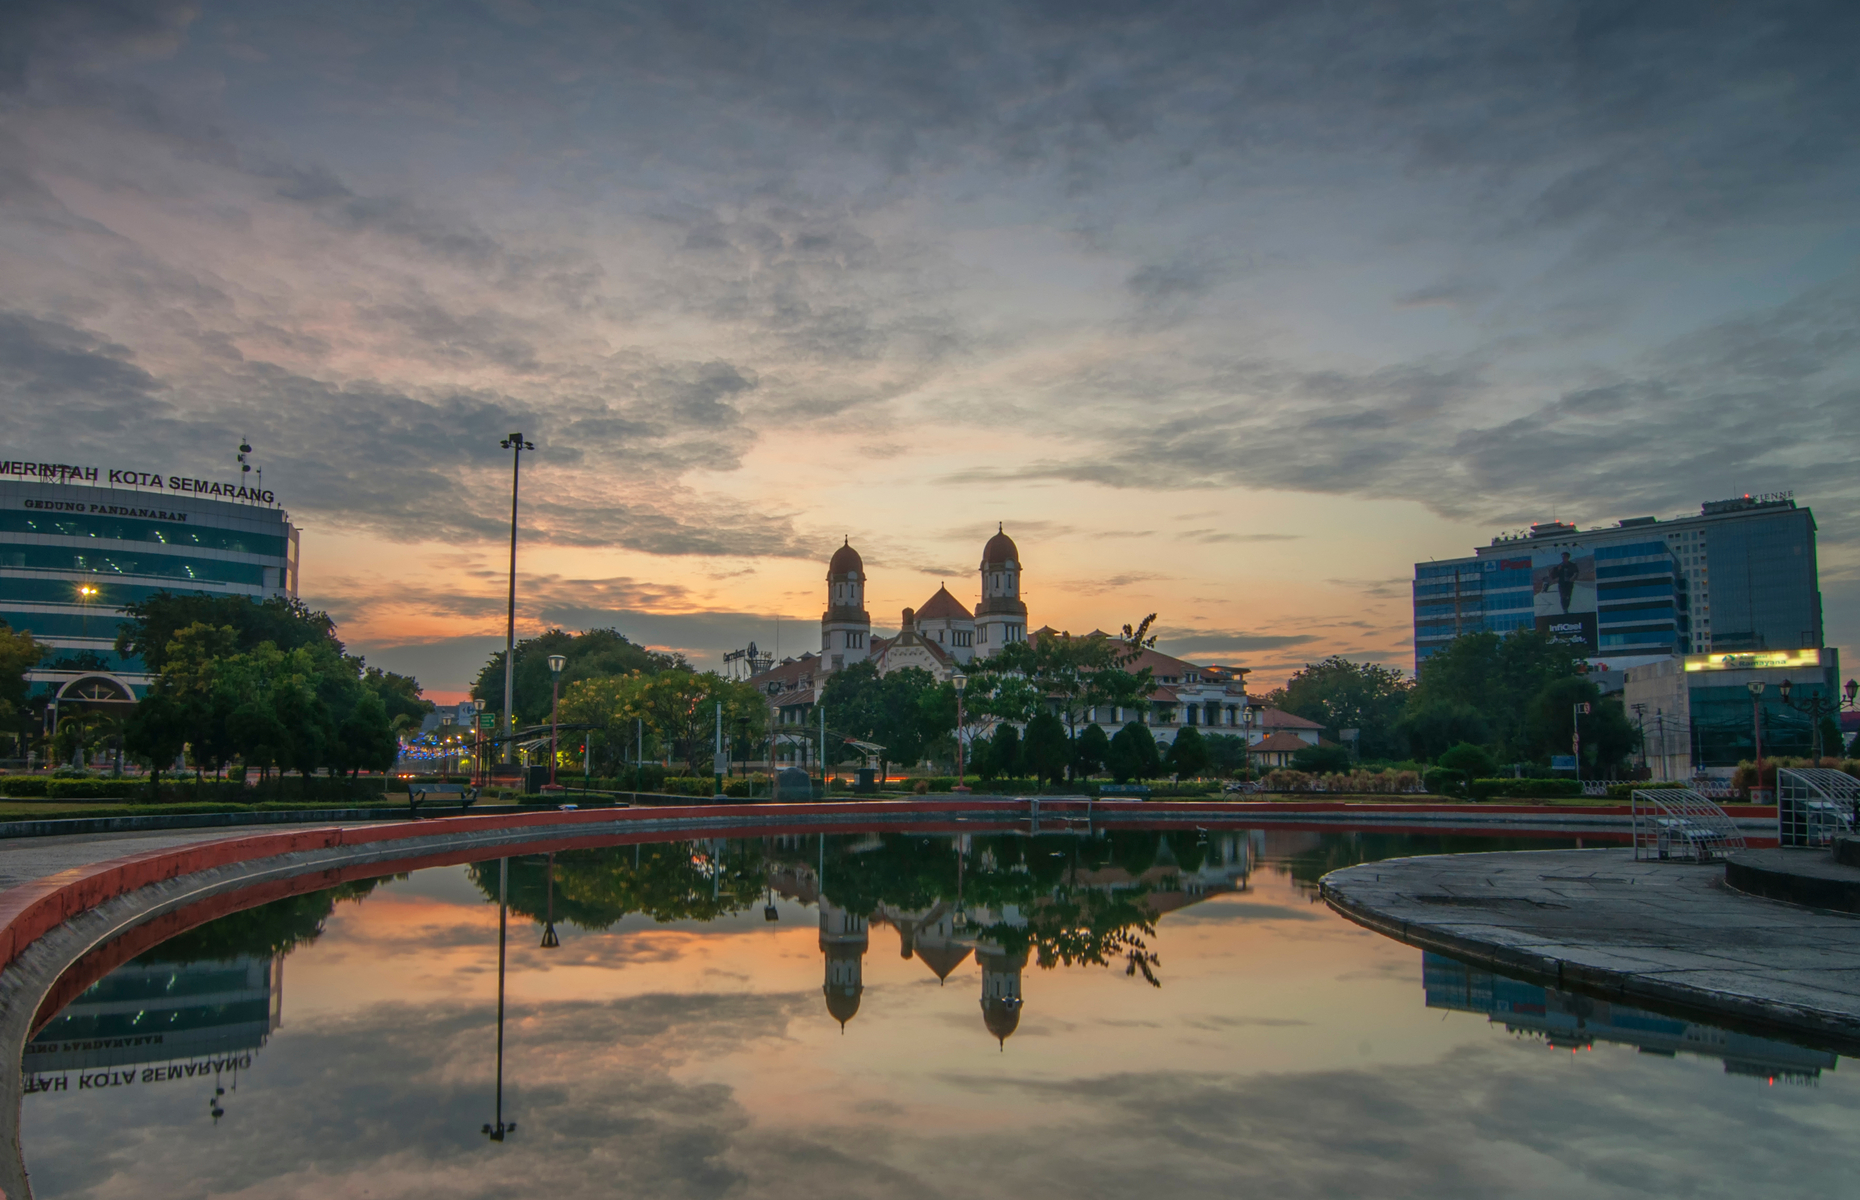 Lawang Sewu in Semarang at sunset (Image: fredyngahu/Shutterstock)